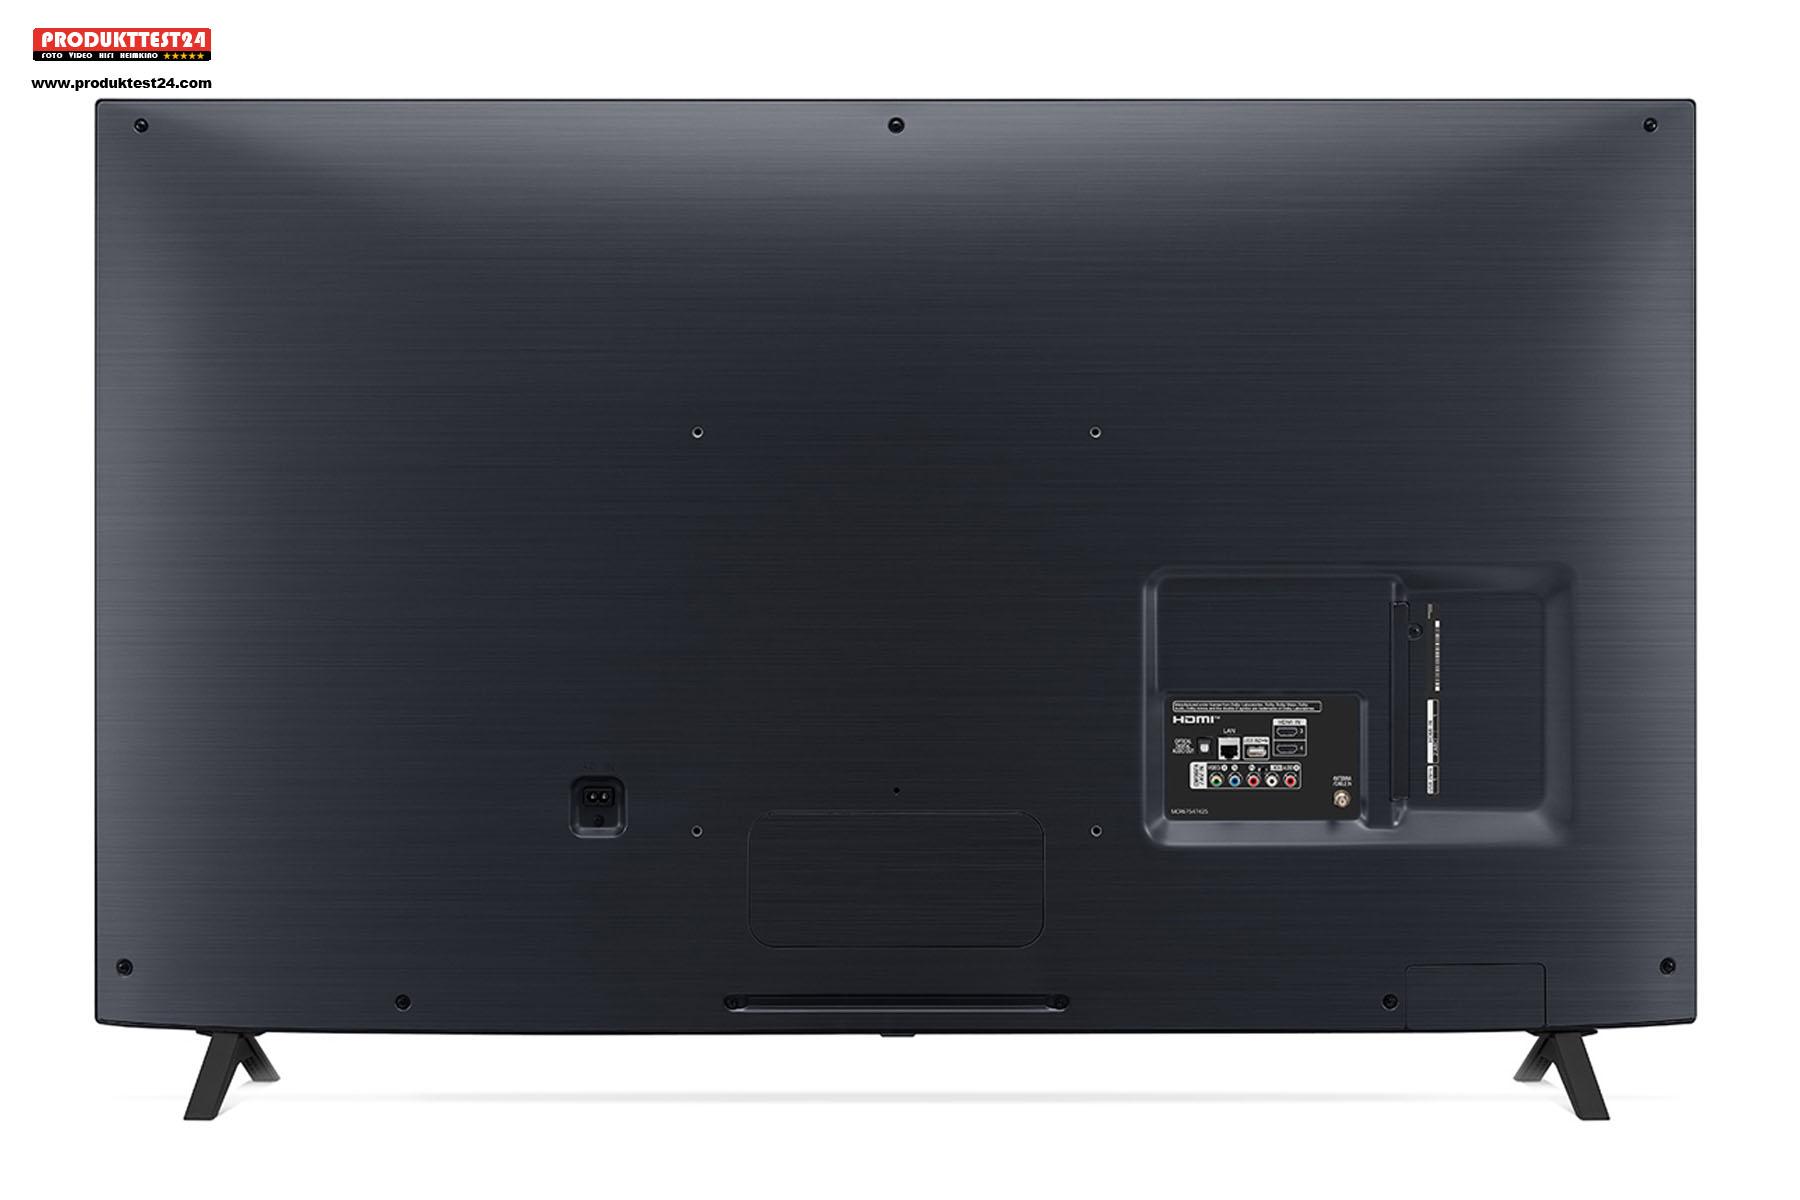 Die Rückseite des LG 55NANO806NA